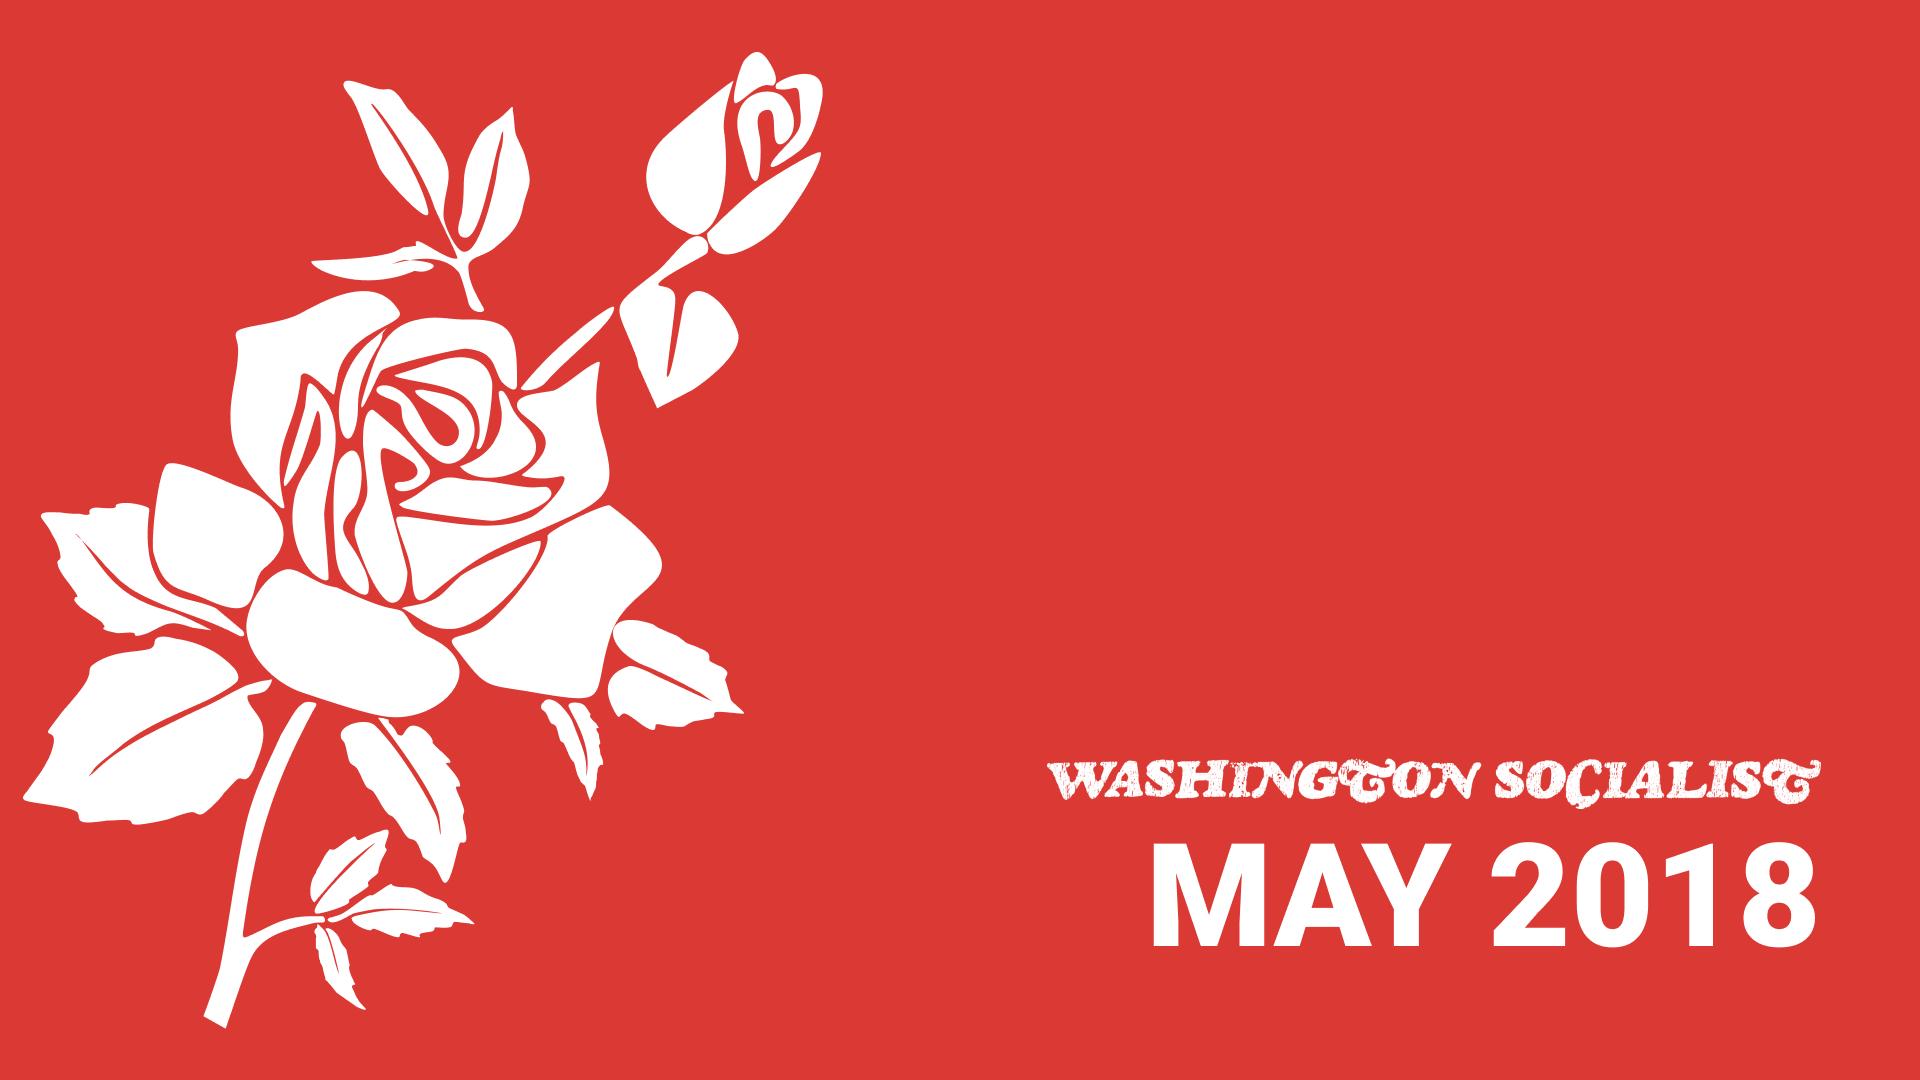 Washington Socialist Cover, May 2018